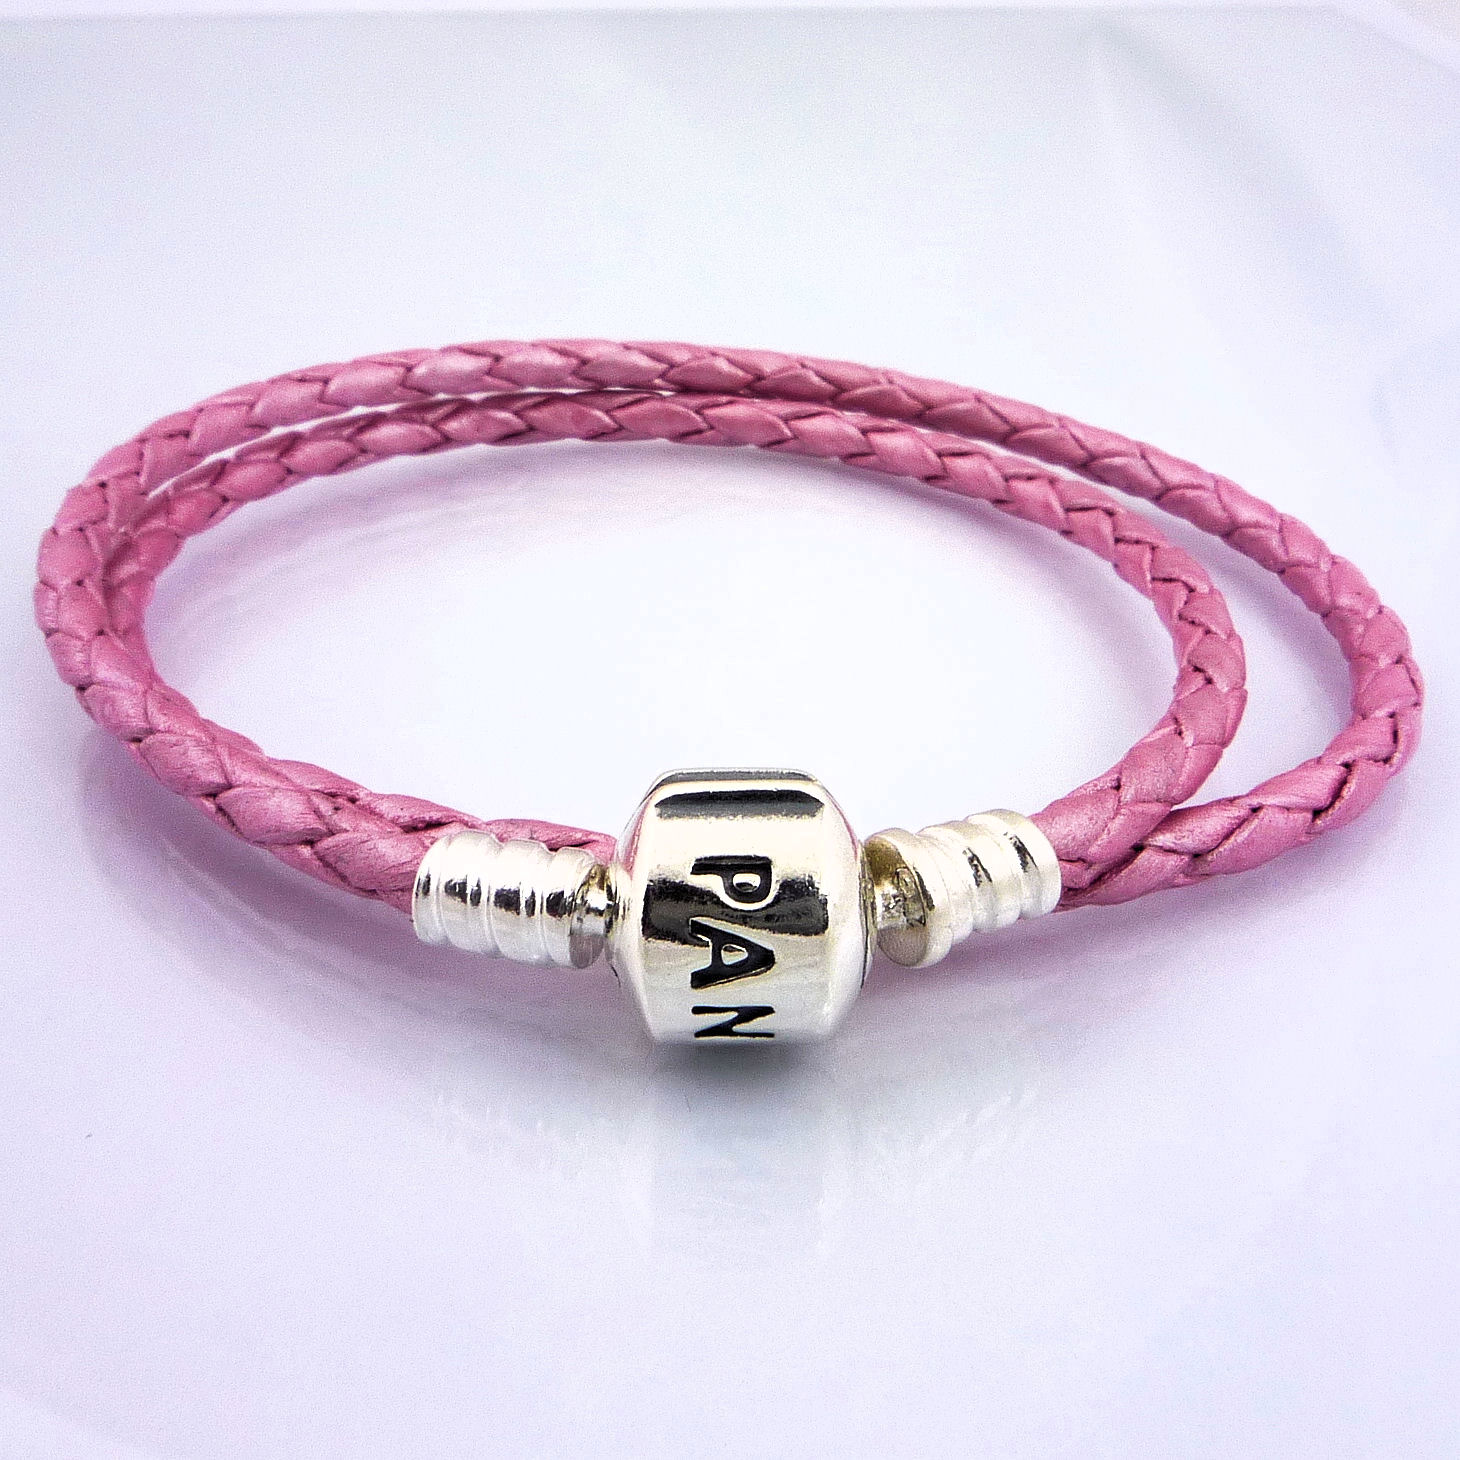 authentic pandora pink double leather bracelet small 35cm